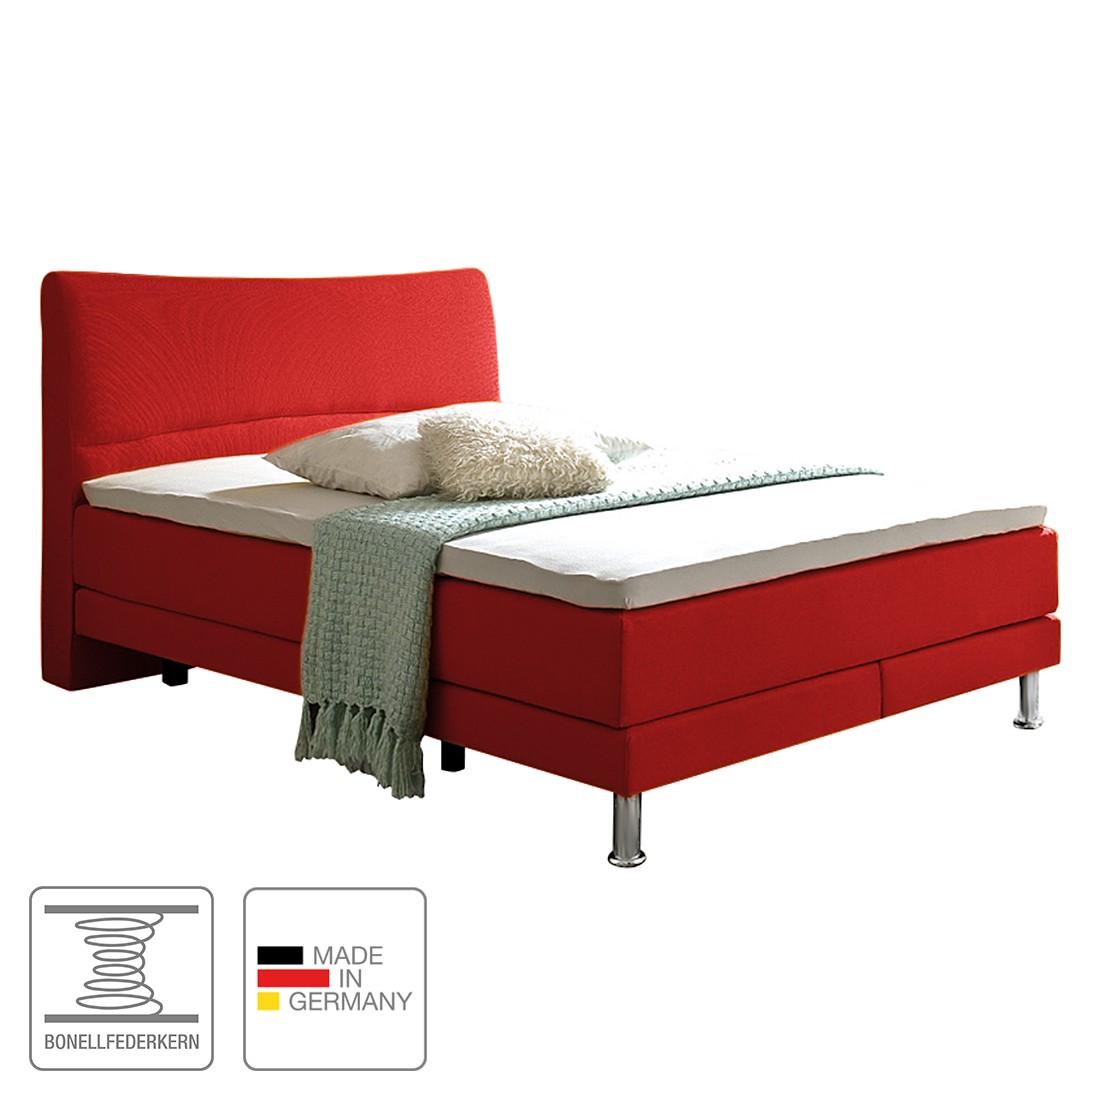 prix des meuble chambre 1497. Black Bedroom Furniture Sets. Home Design Ideas